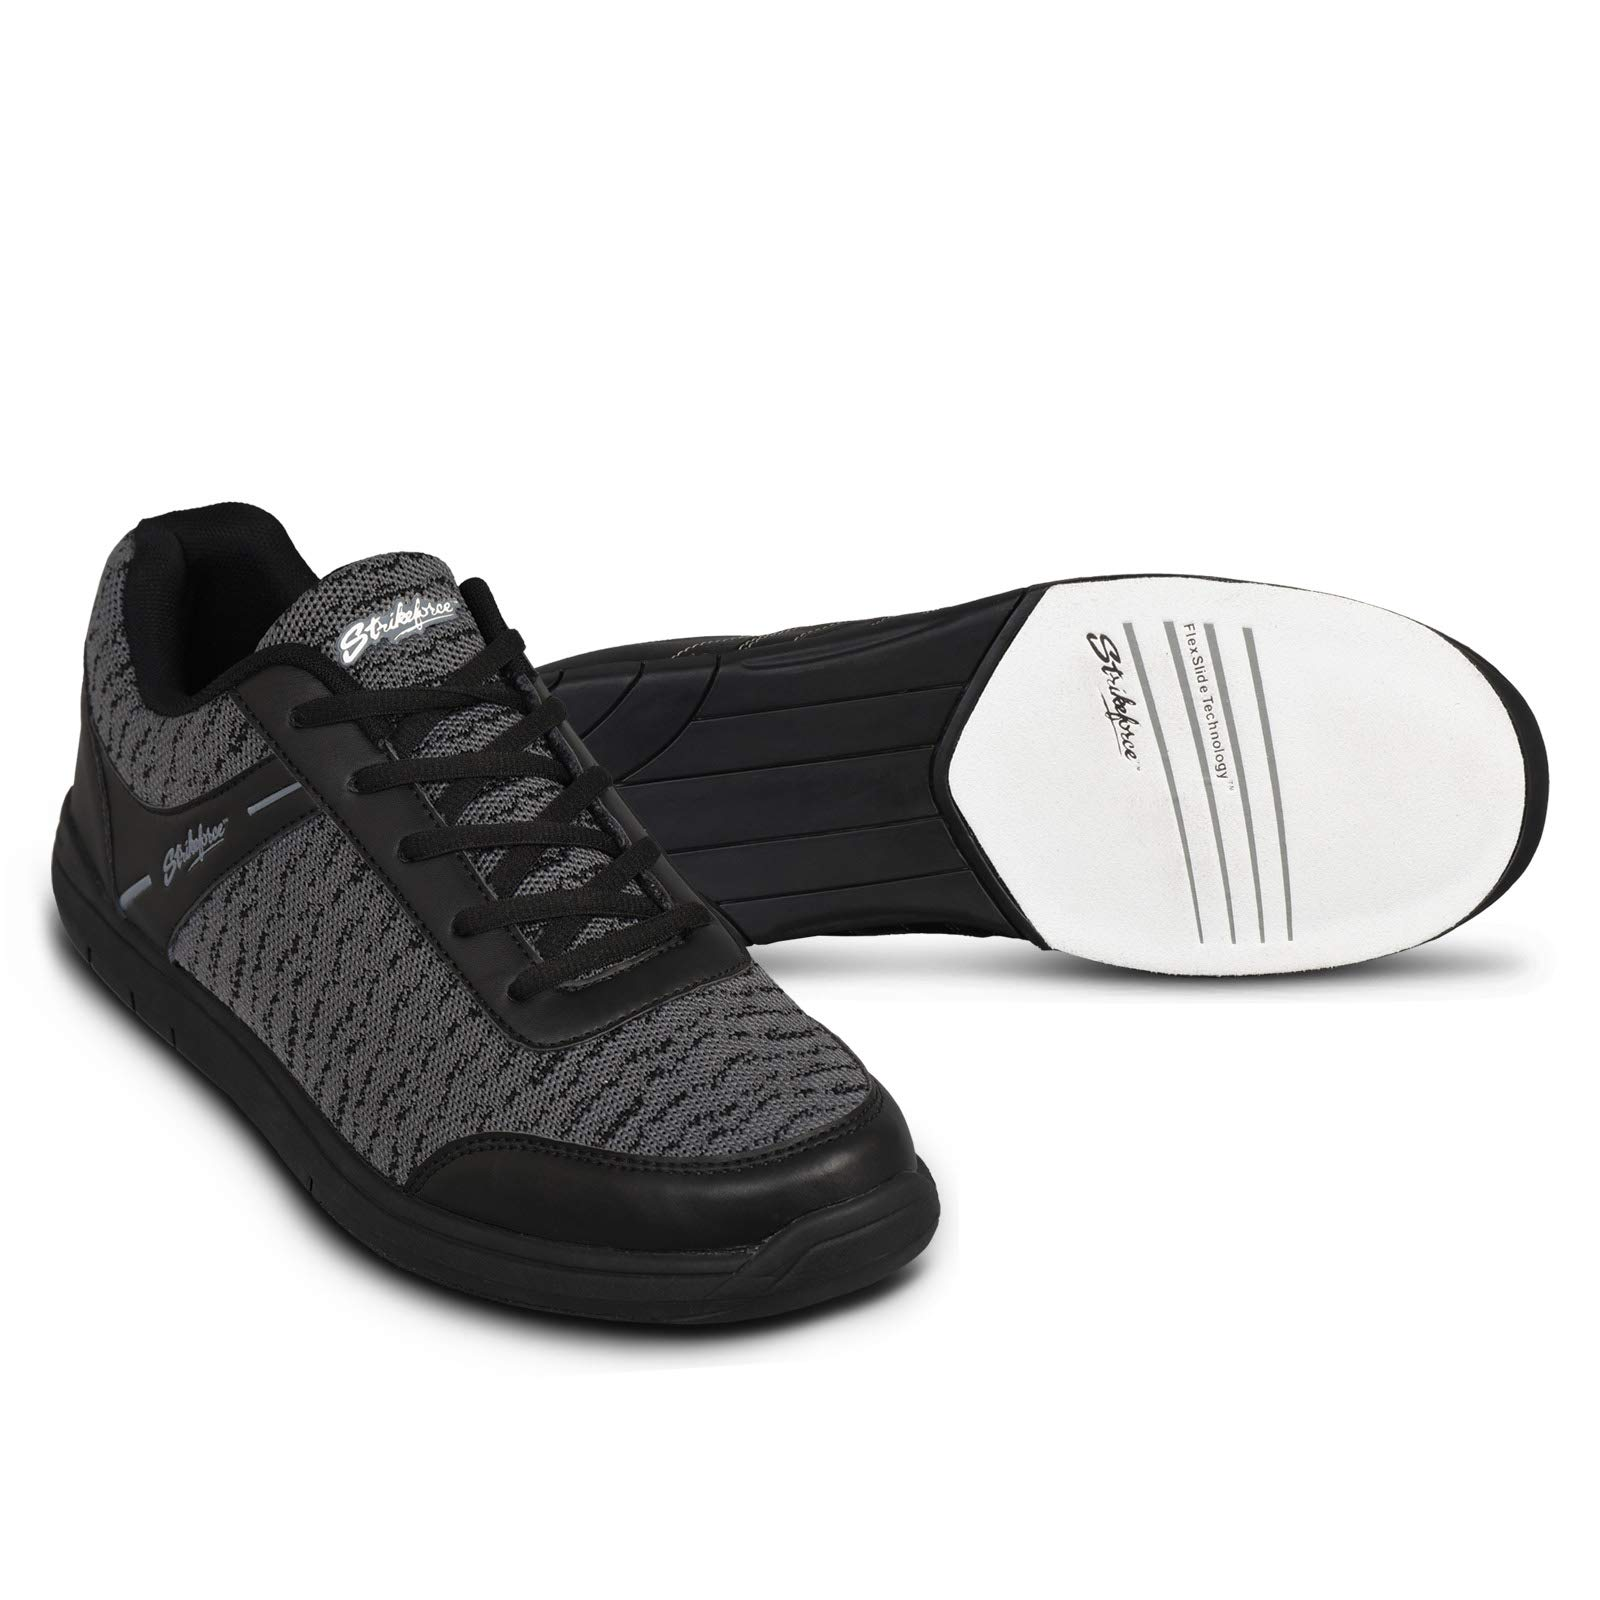 KR Strikeforce Men's Flyer Mesh Bowling Shoes, Black/Steel, Size 6